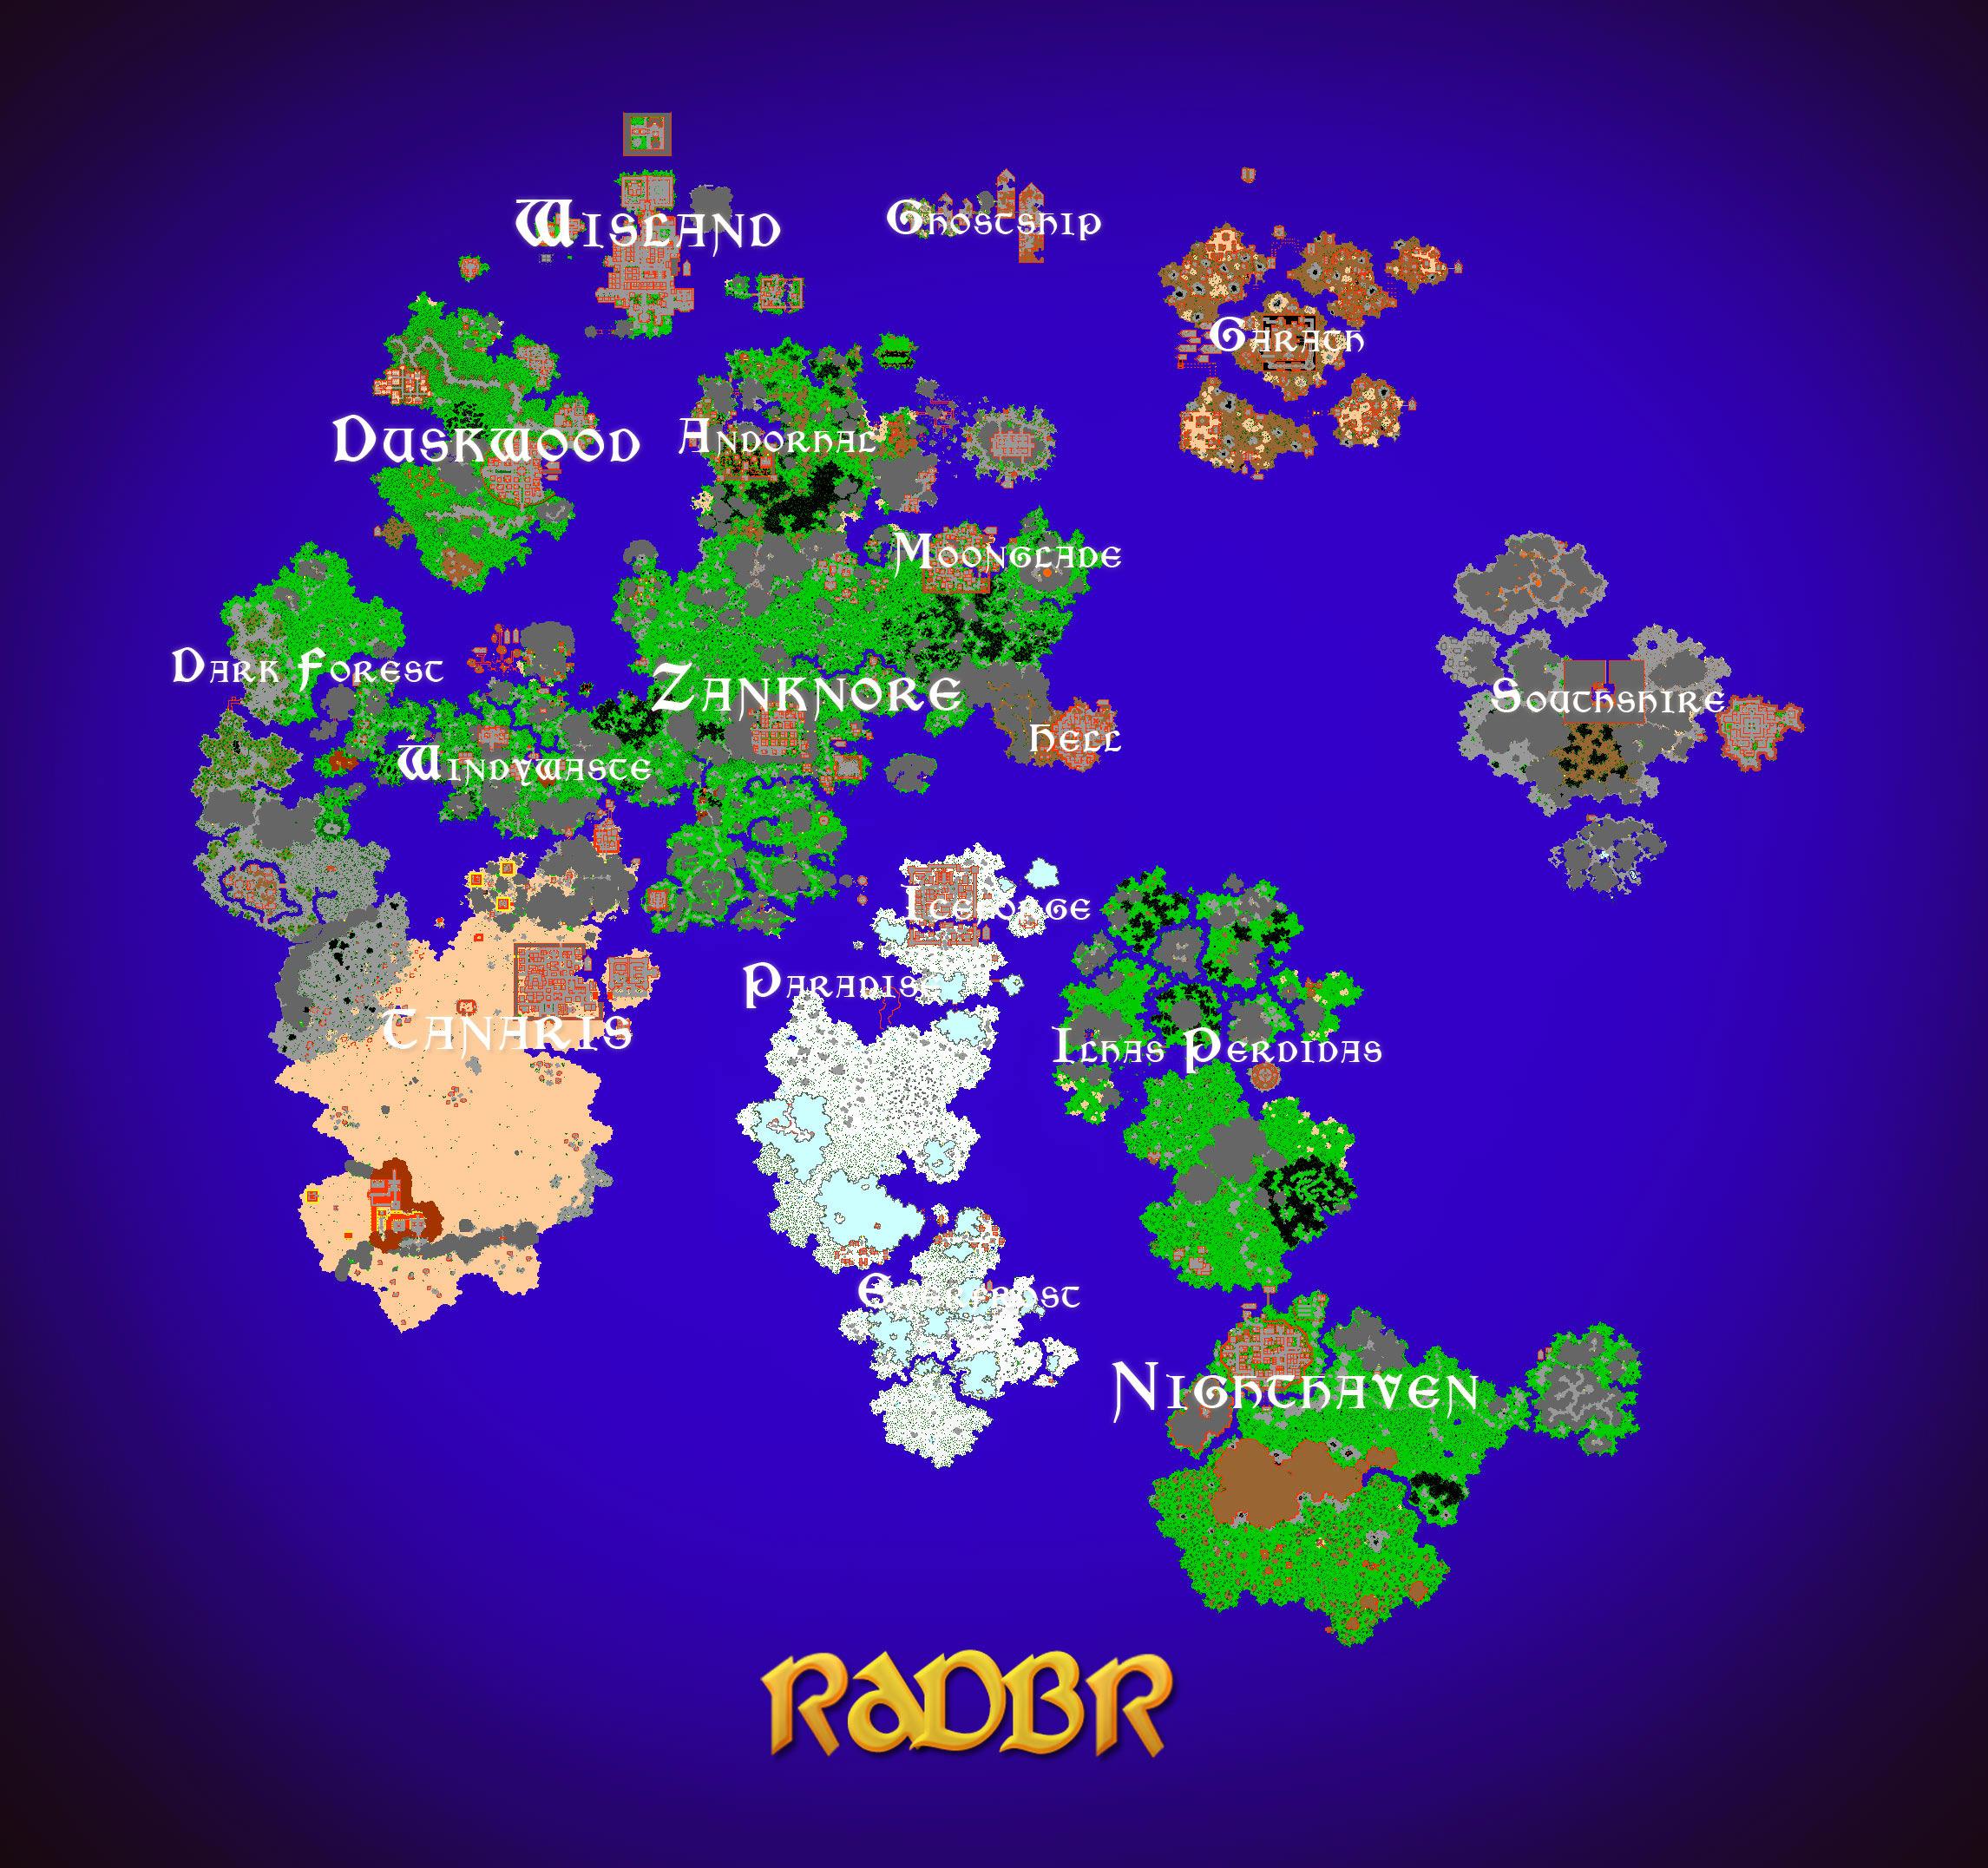 Radbr Servidor De Tibia Map